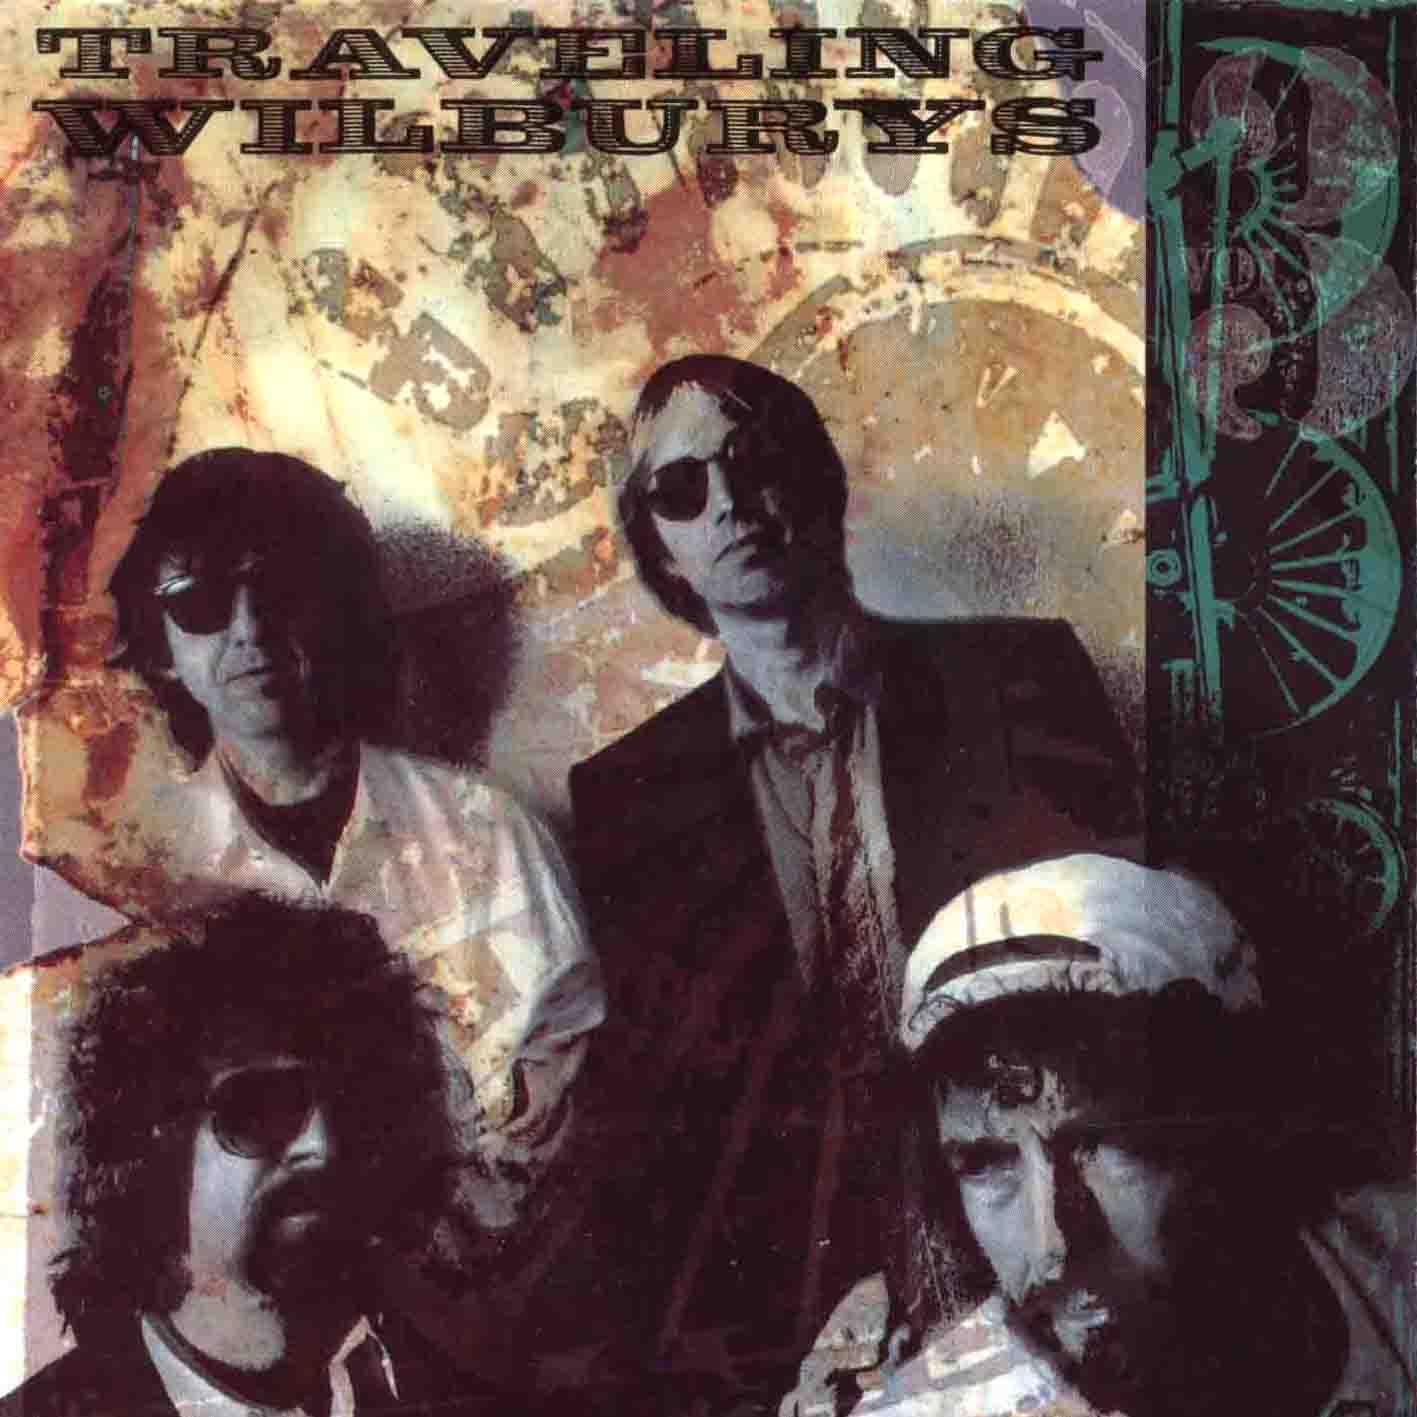 Toda Mi M 250 Sica Traveling Wilburys Vol 3 1990